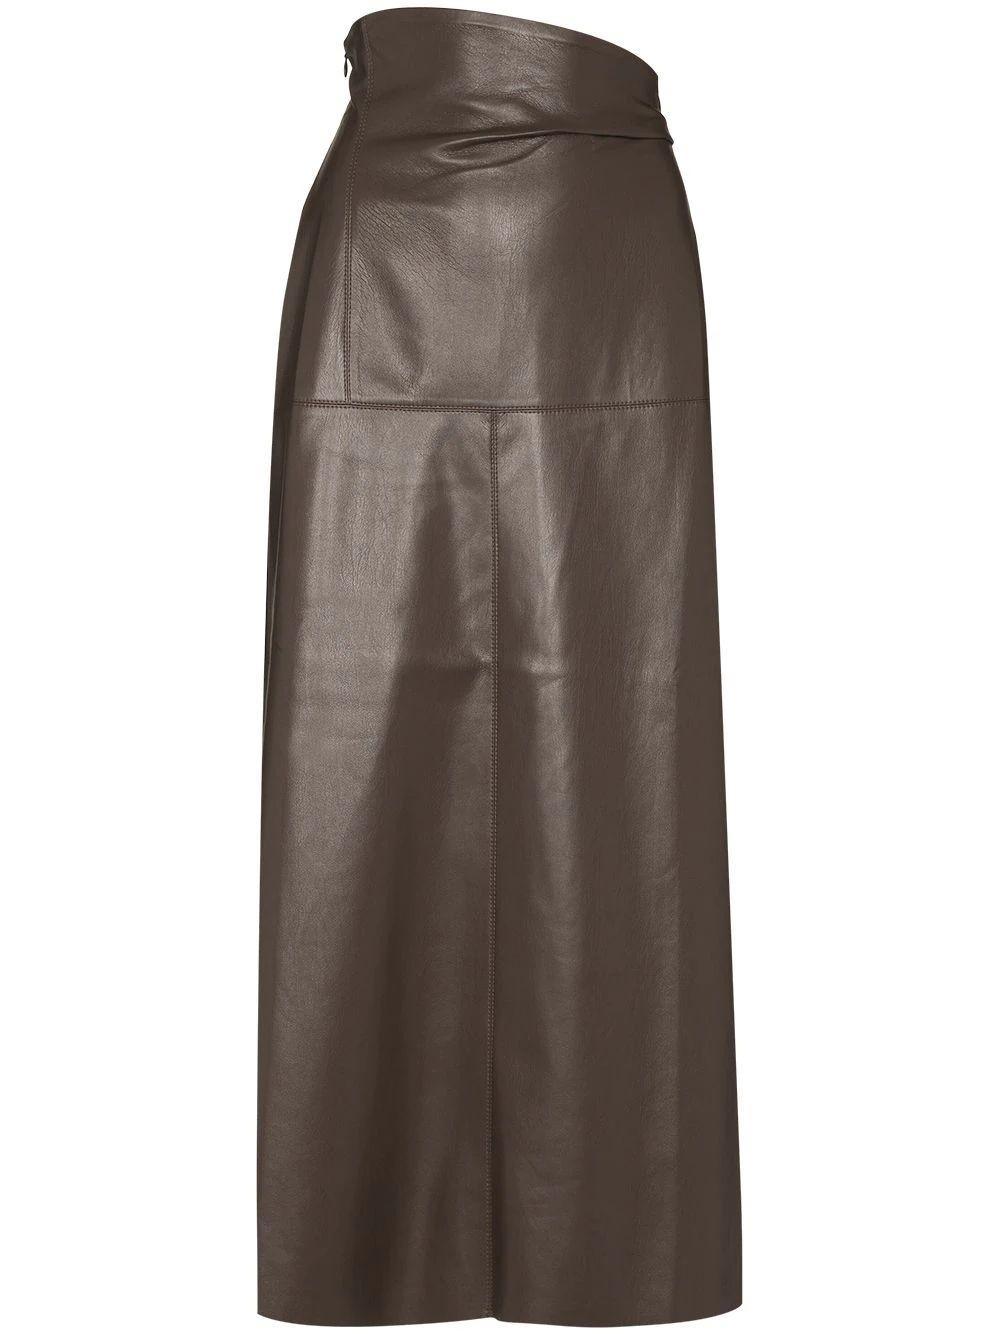 Melody Vegan Leather Aline Midi Skirt Item # NW21FWSK00476